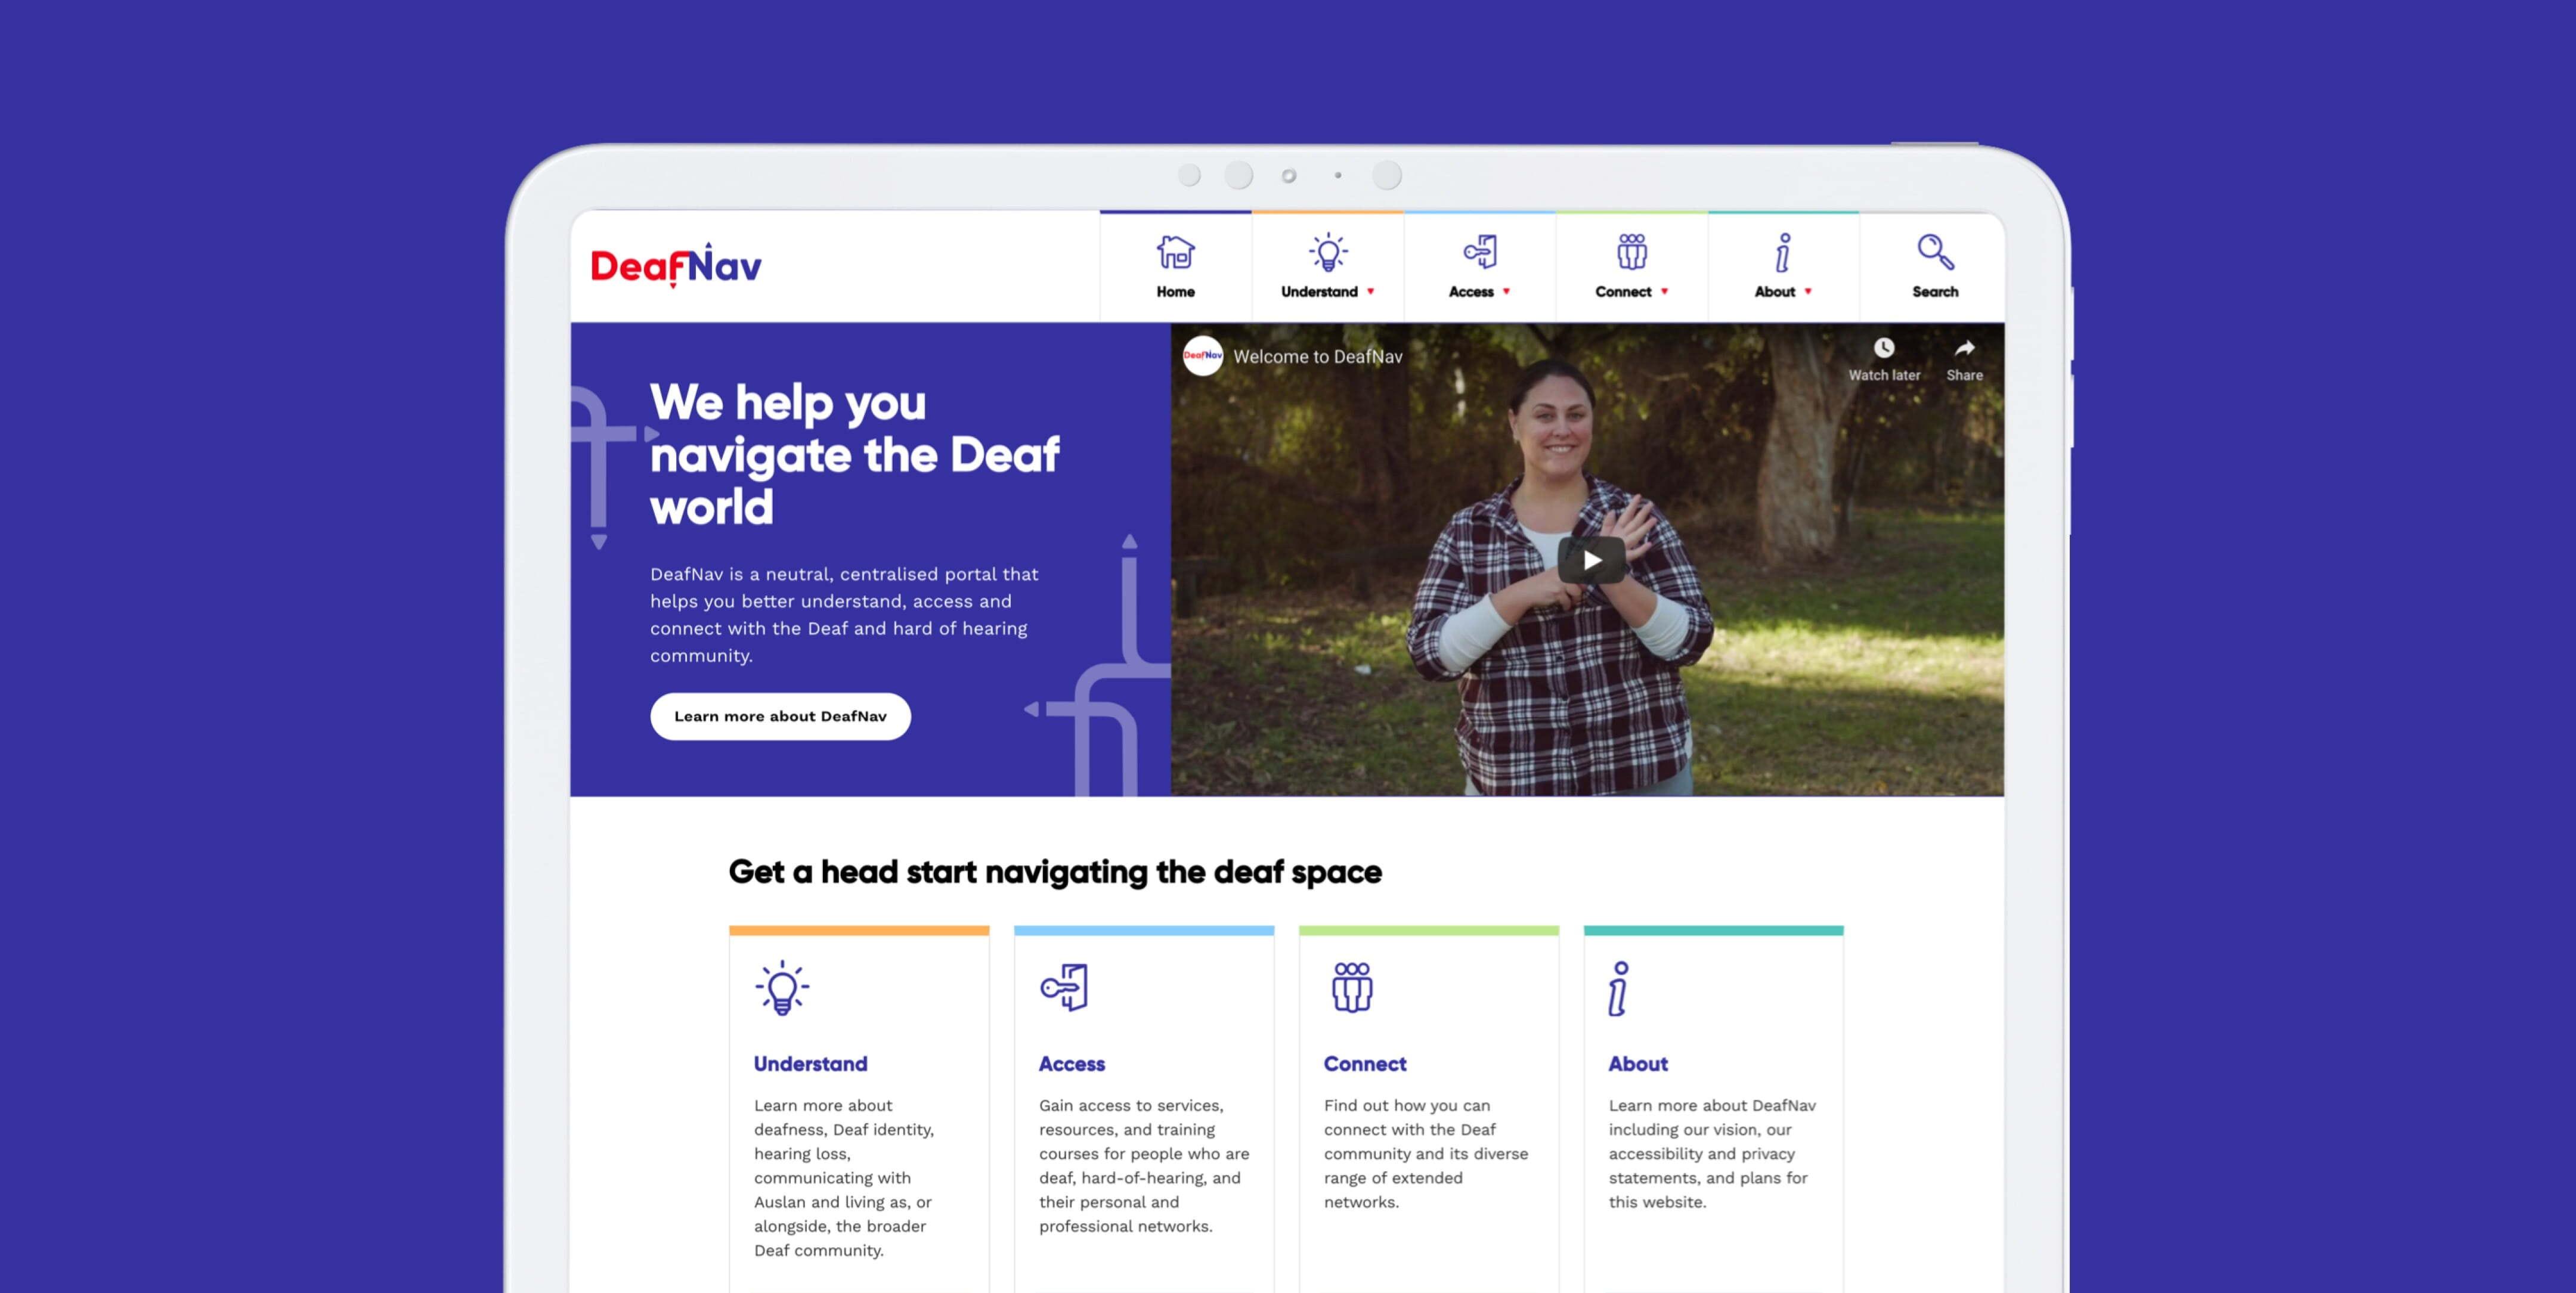 Deafnav Desktop view home page